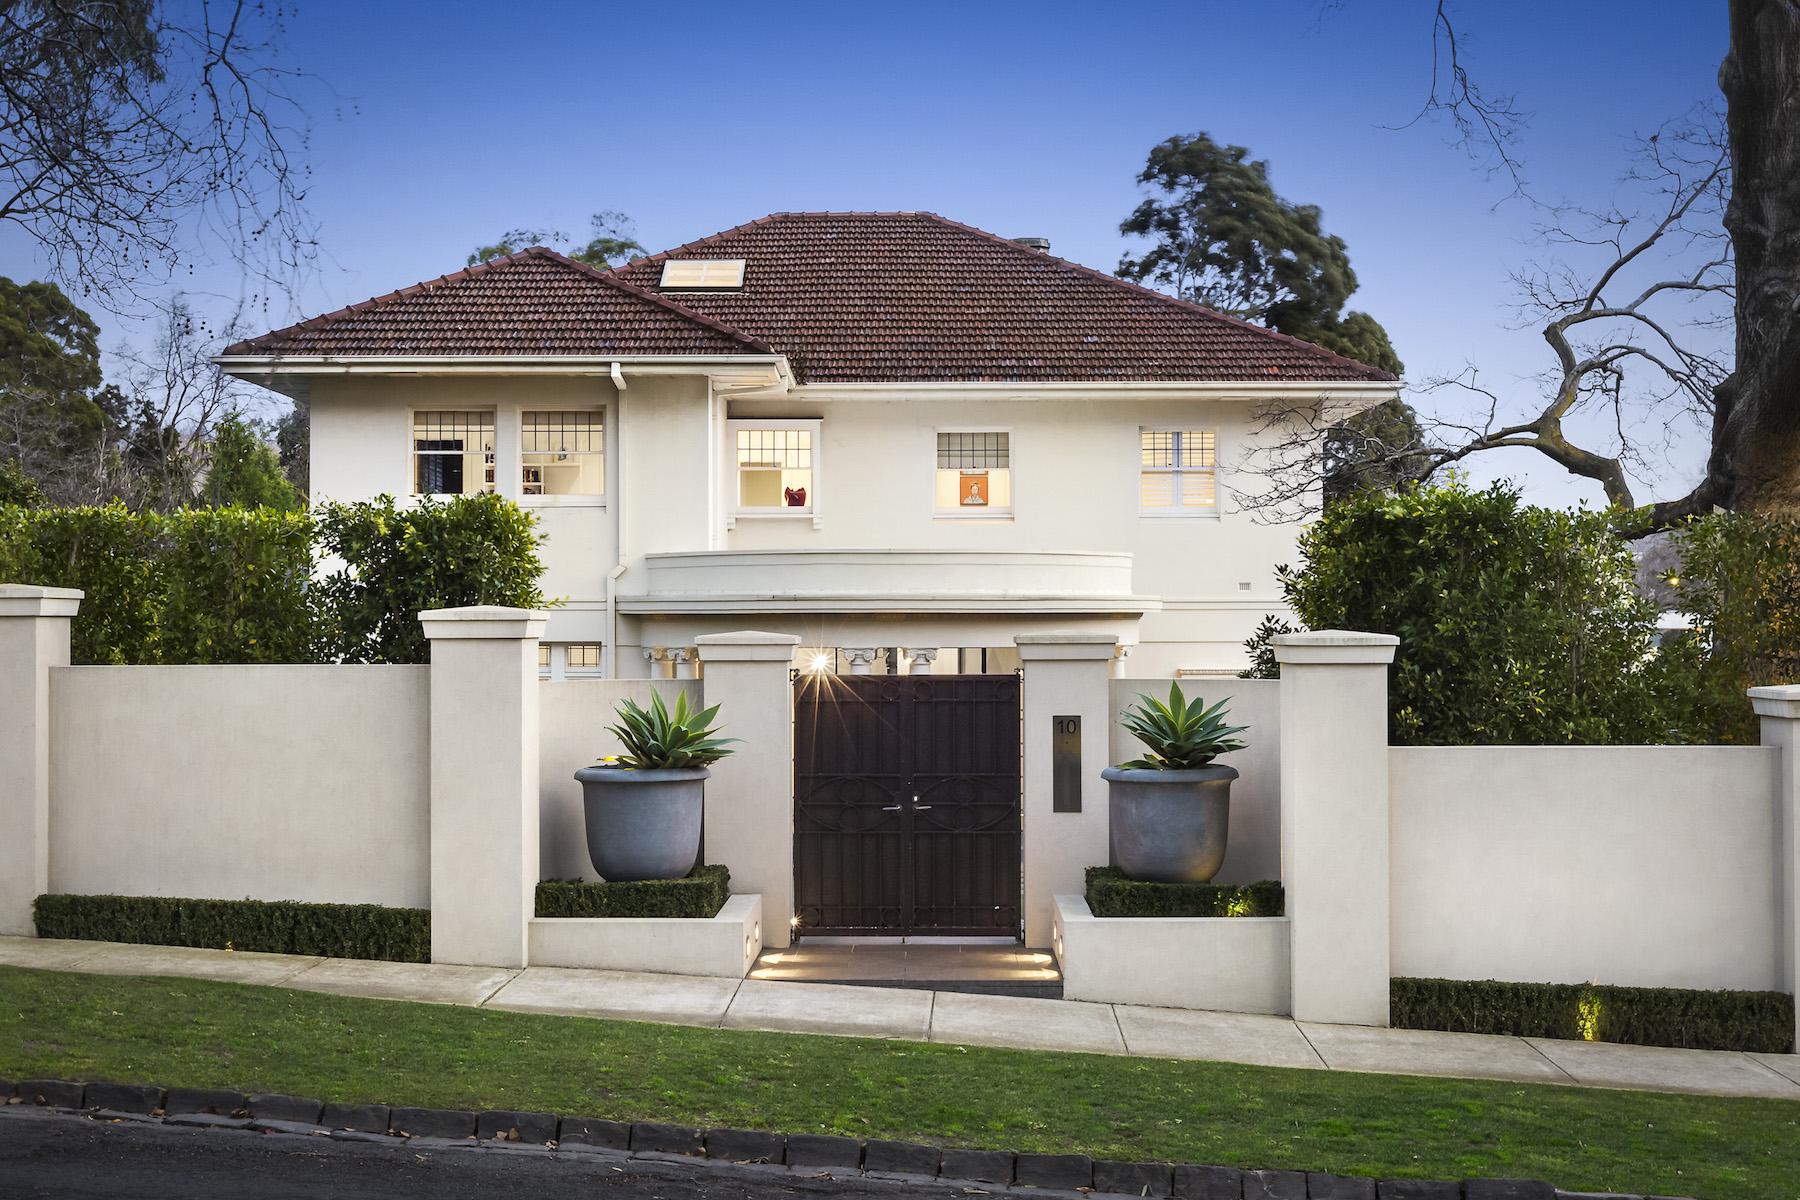 Terreno por un Venta en 10 Struan Street, Toorak Melbourne, Victoria, 3142 Australia